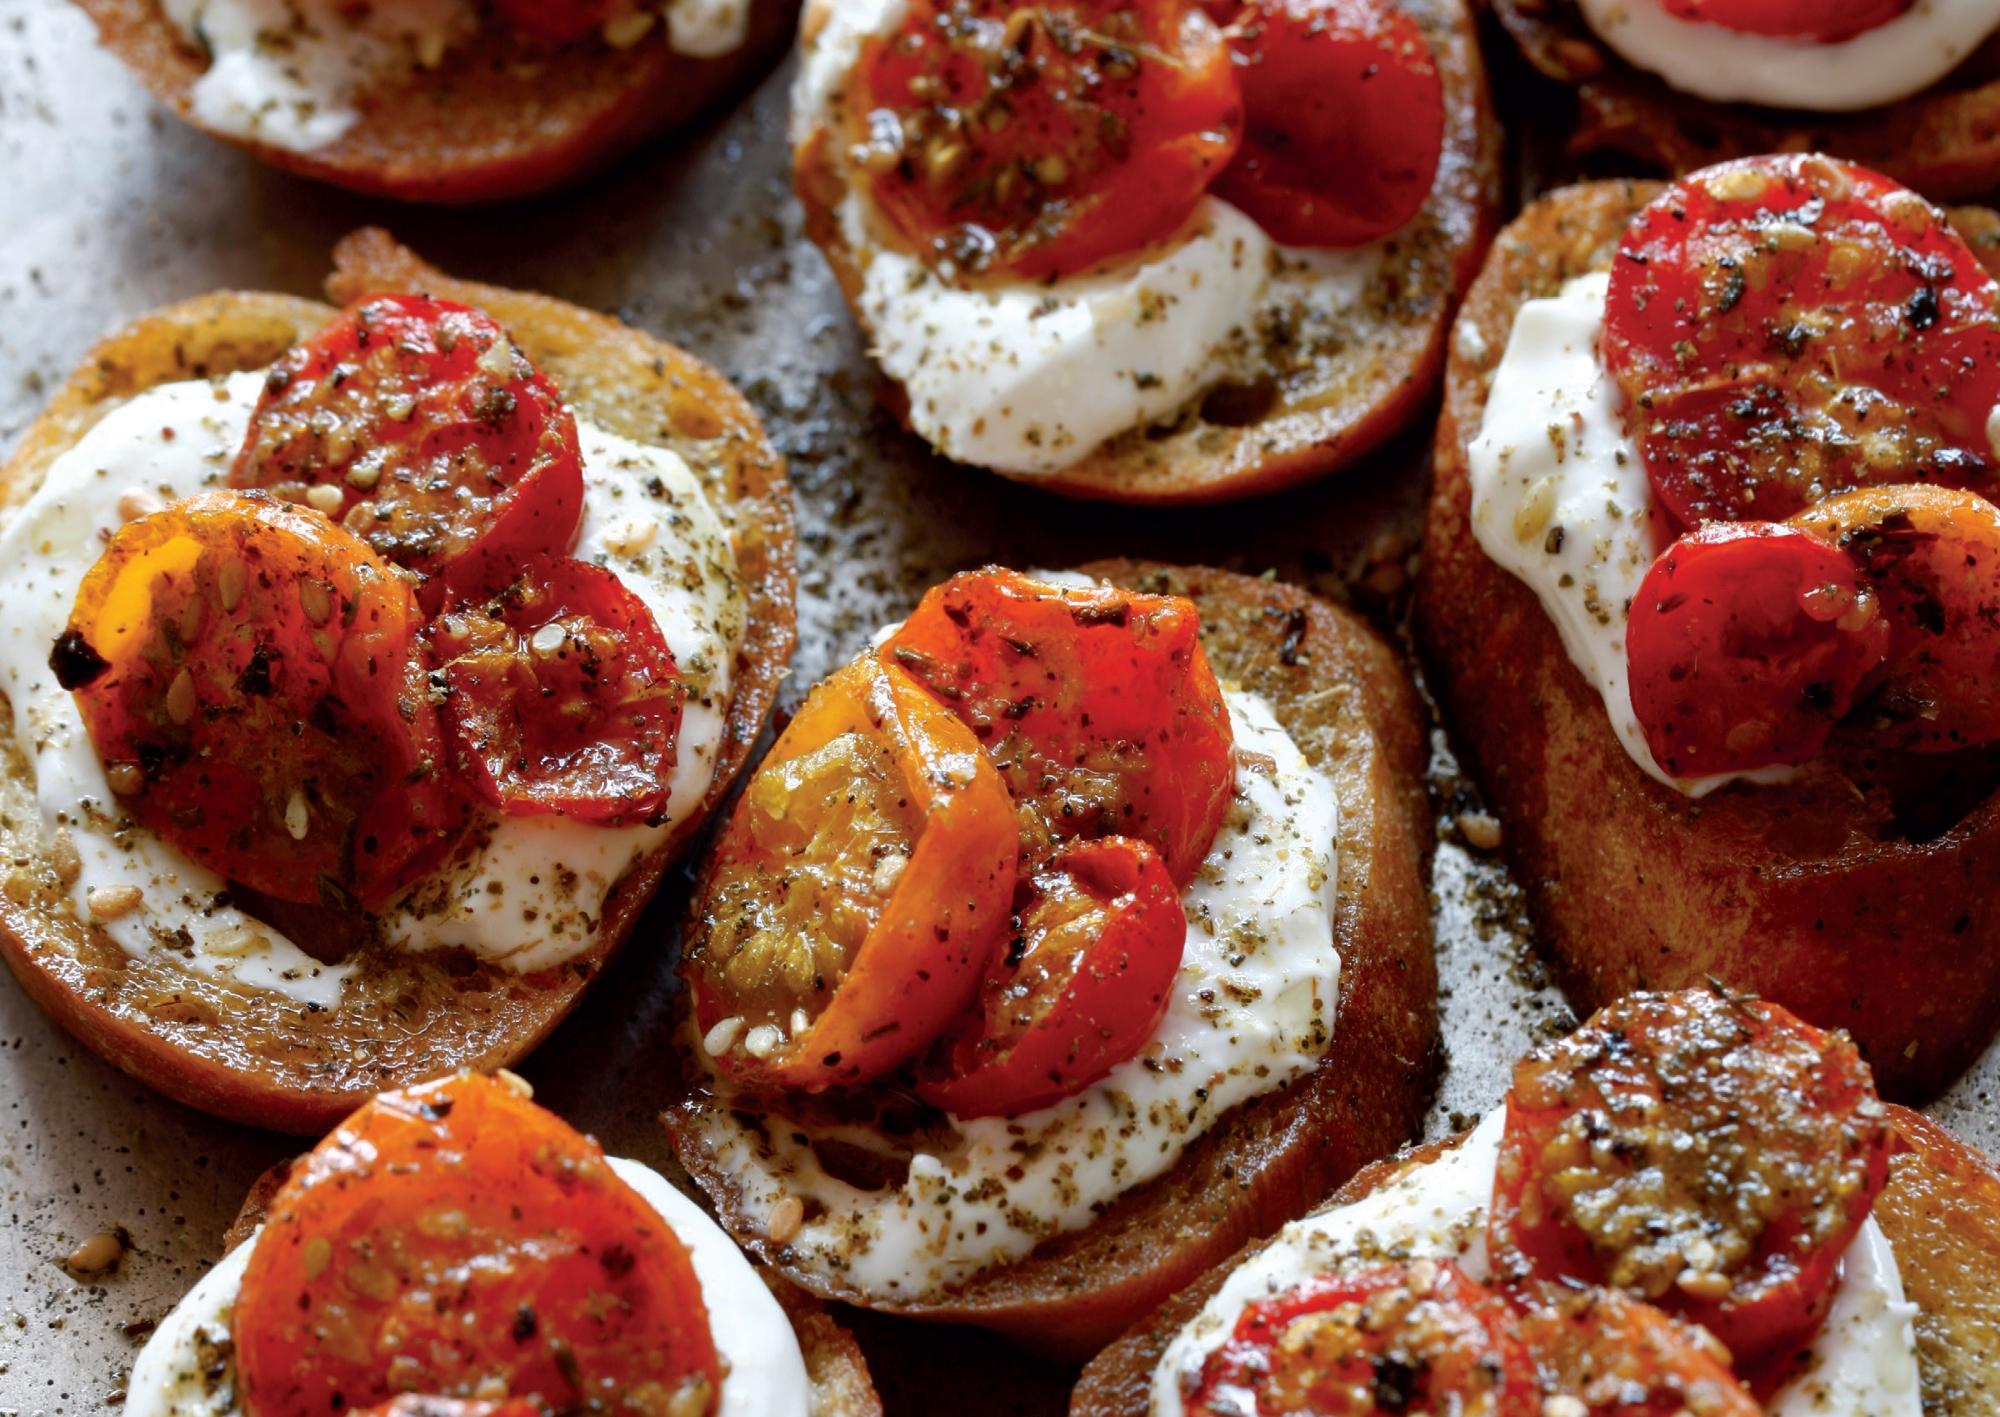 Maureen's Za'atar Roasted Tomato Crostini with Labneh